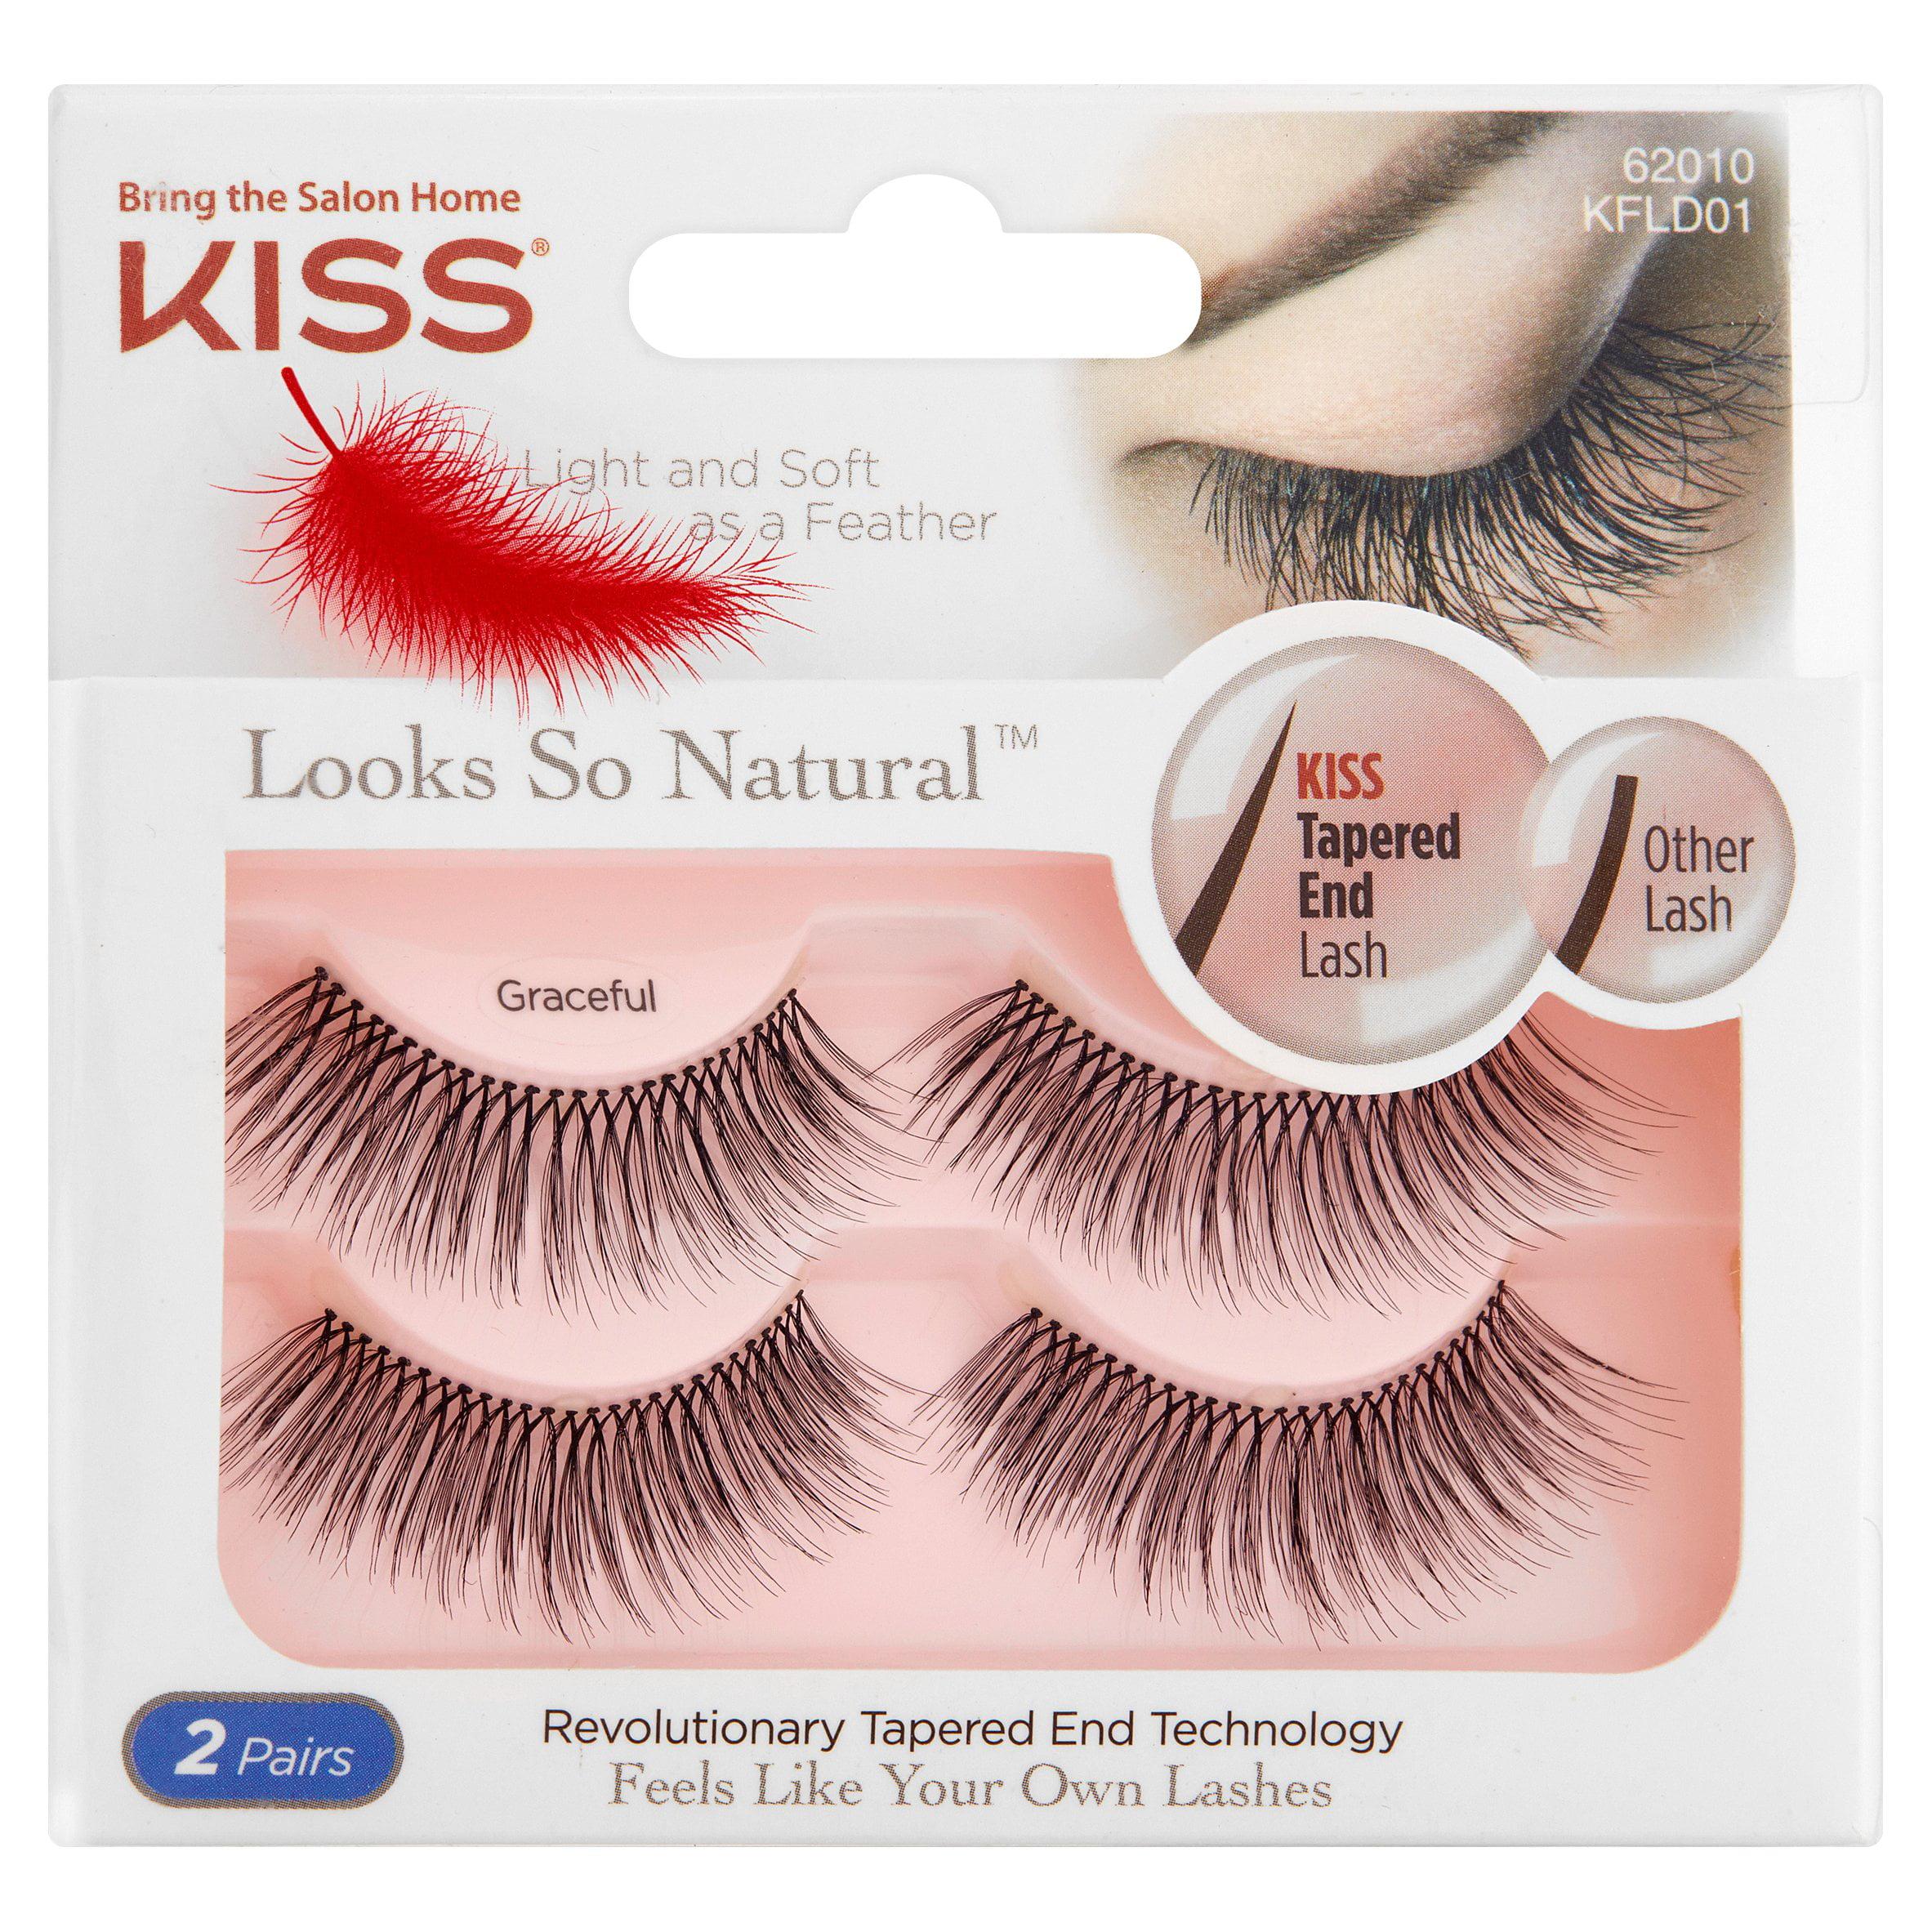 Kiss Looks So Natural 62010 Graceful False Eyelashes, 2 count